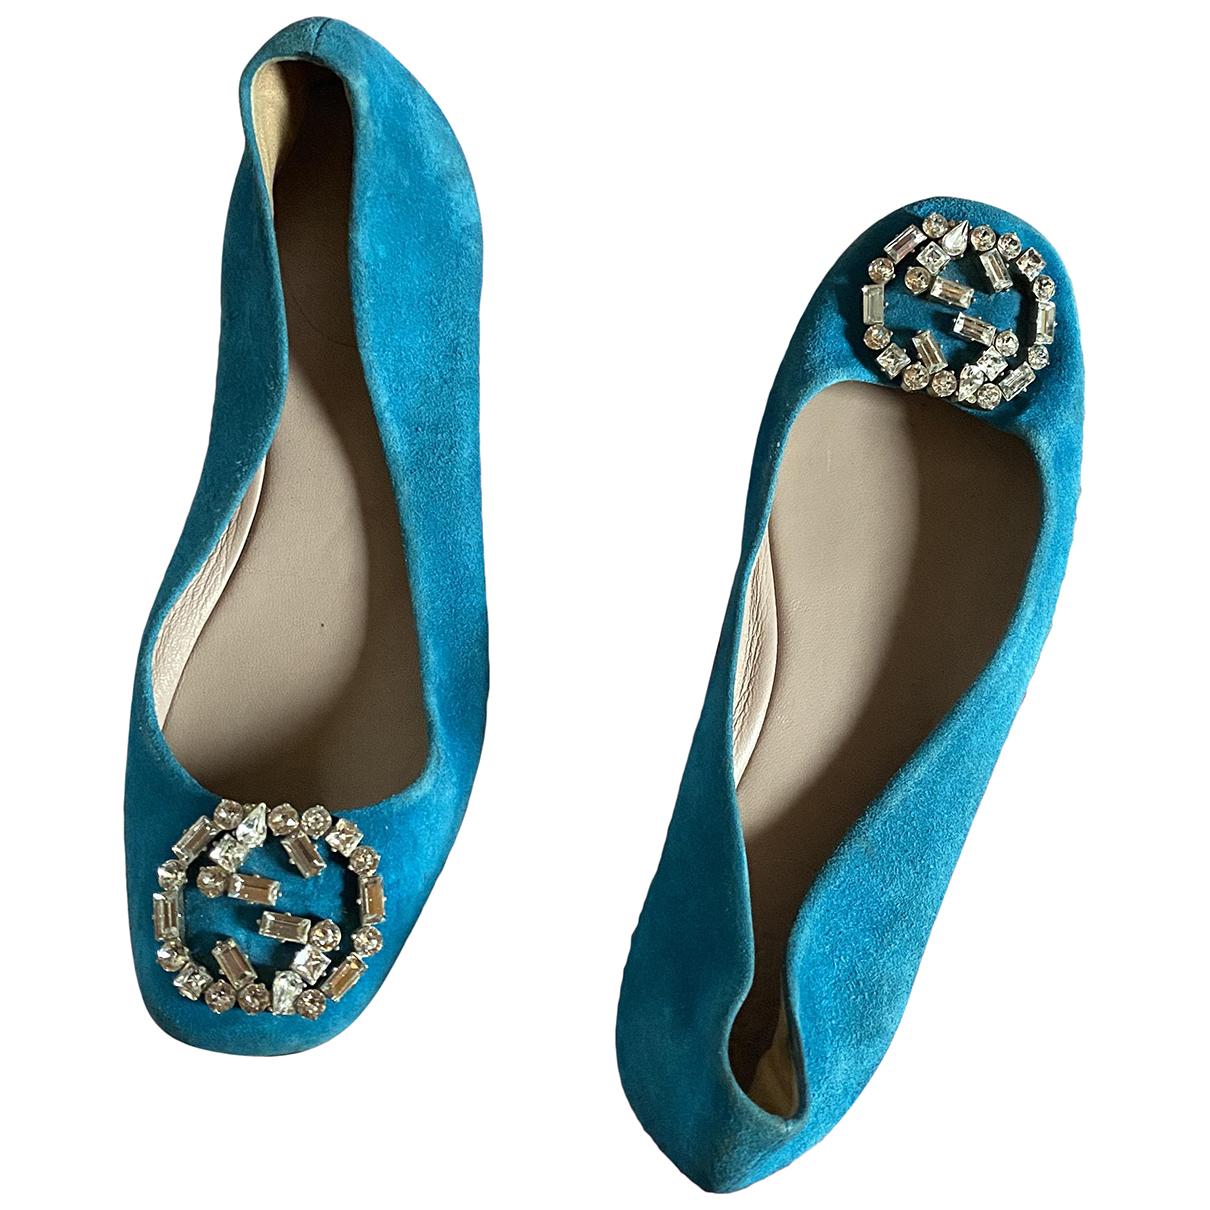 Gucci N Blue Suede Ballet flats for Women 37 EU